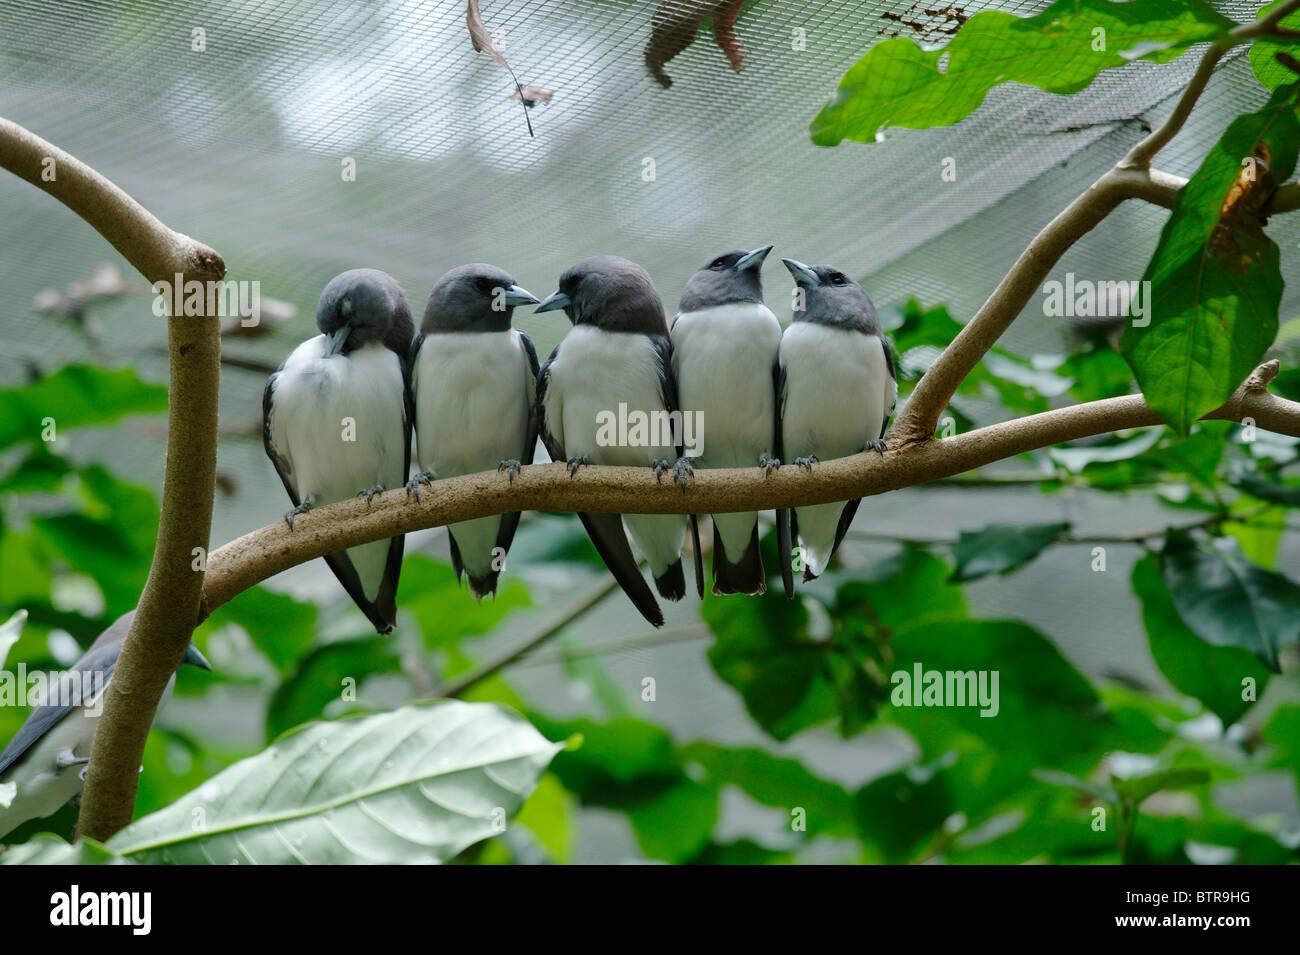 Australia, Territory Wildlife Park, Row of birds perching on tree - Stock Image